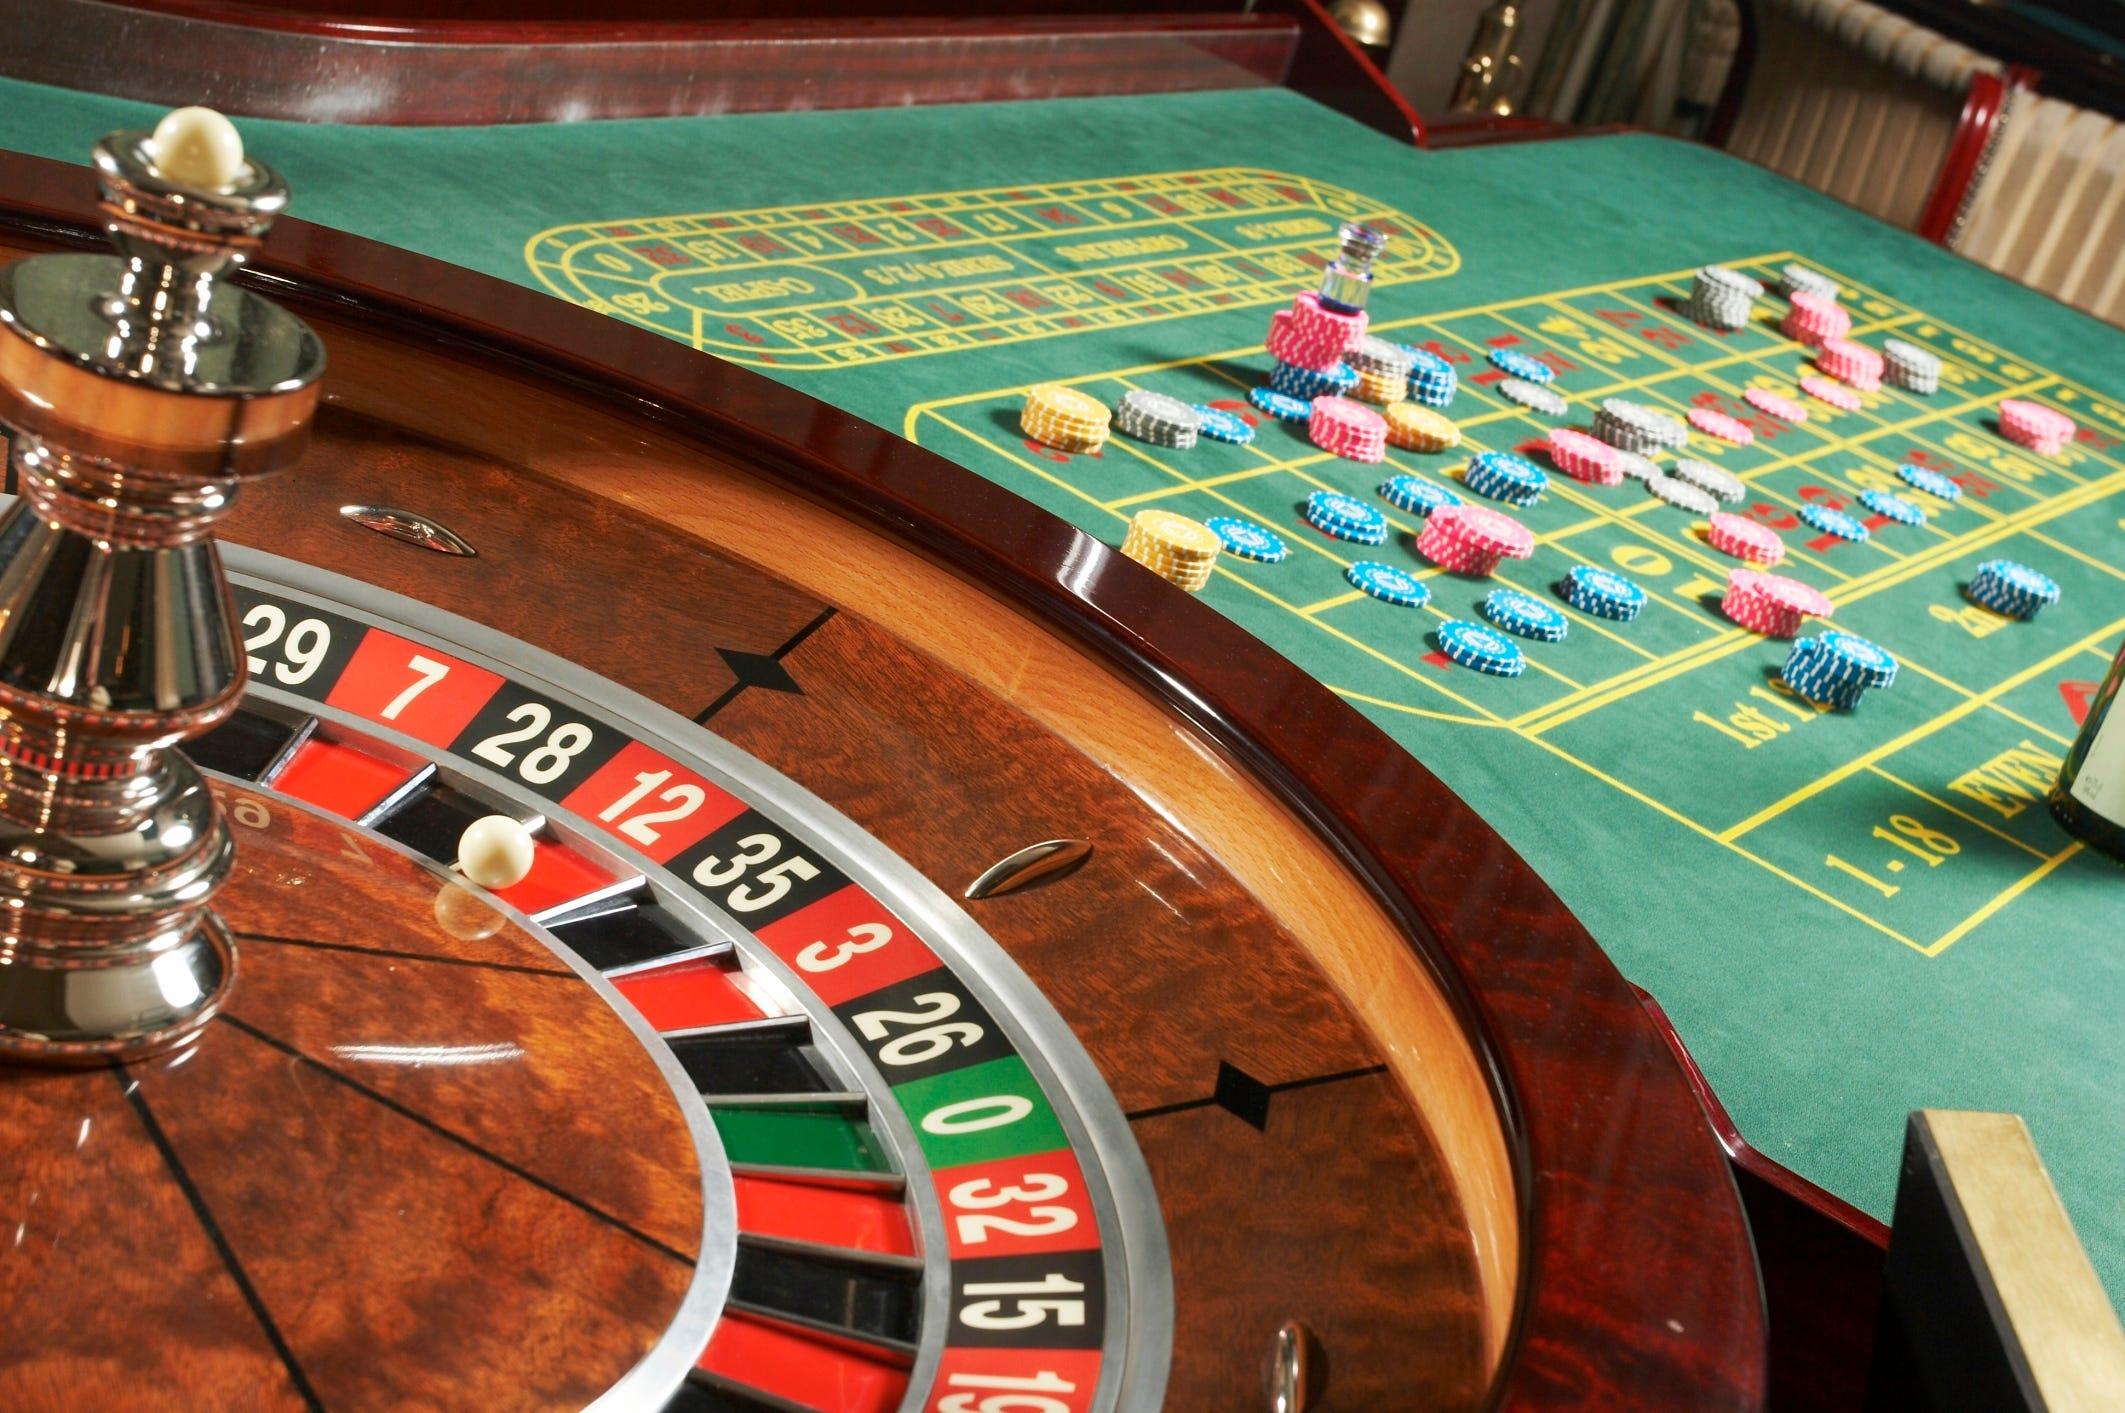 Brooks casino royal reels slot machine free